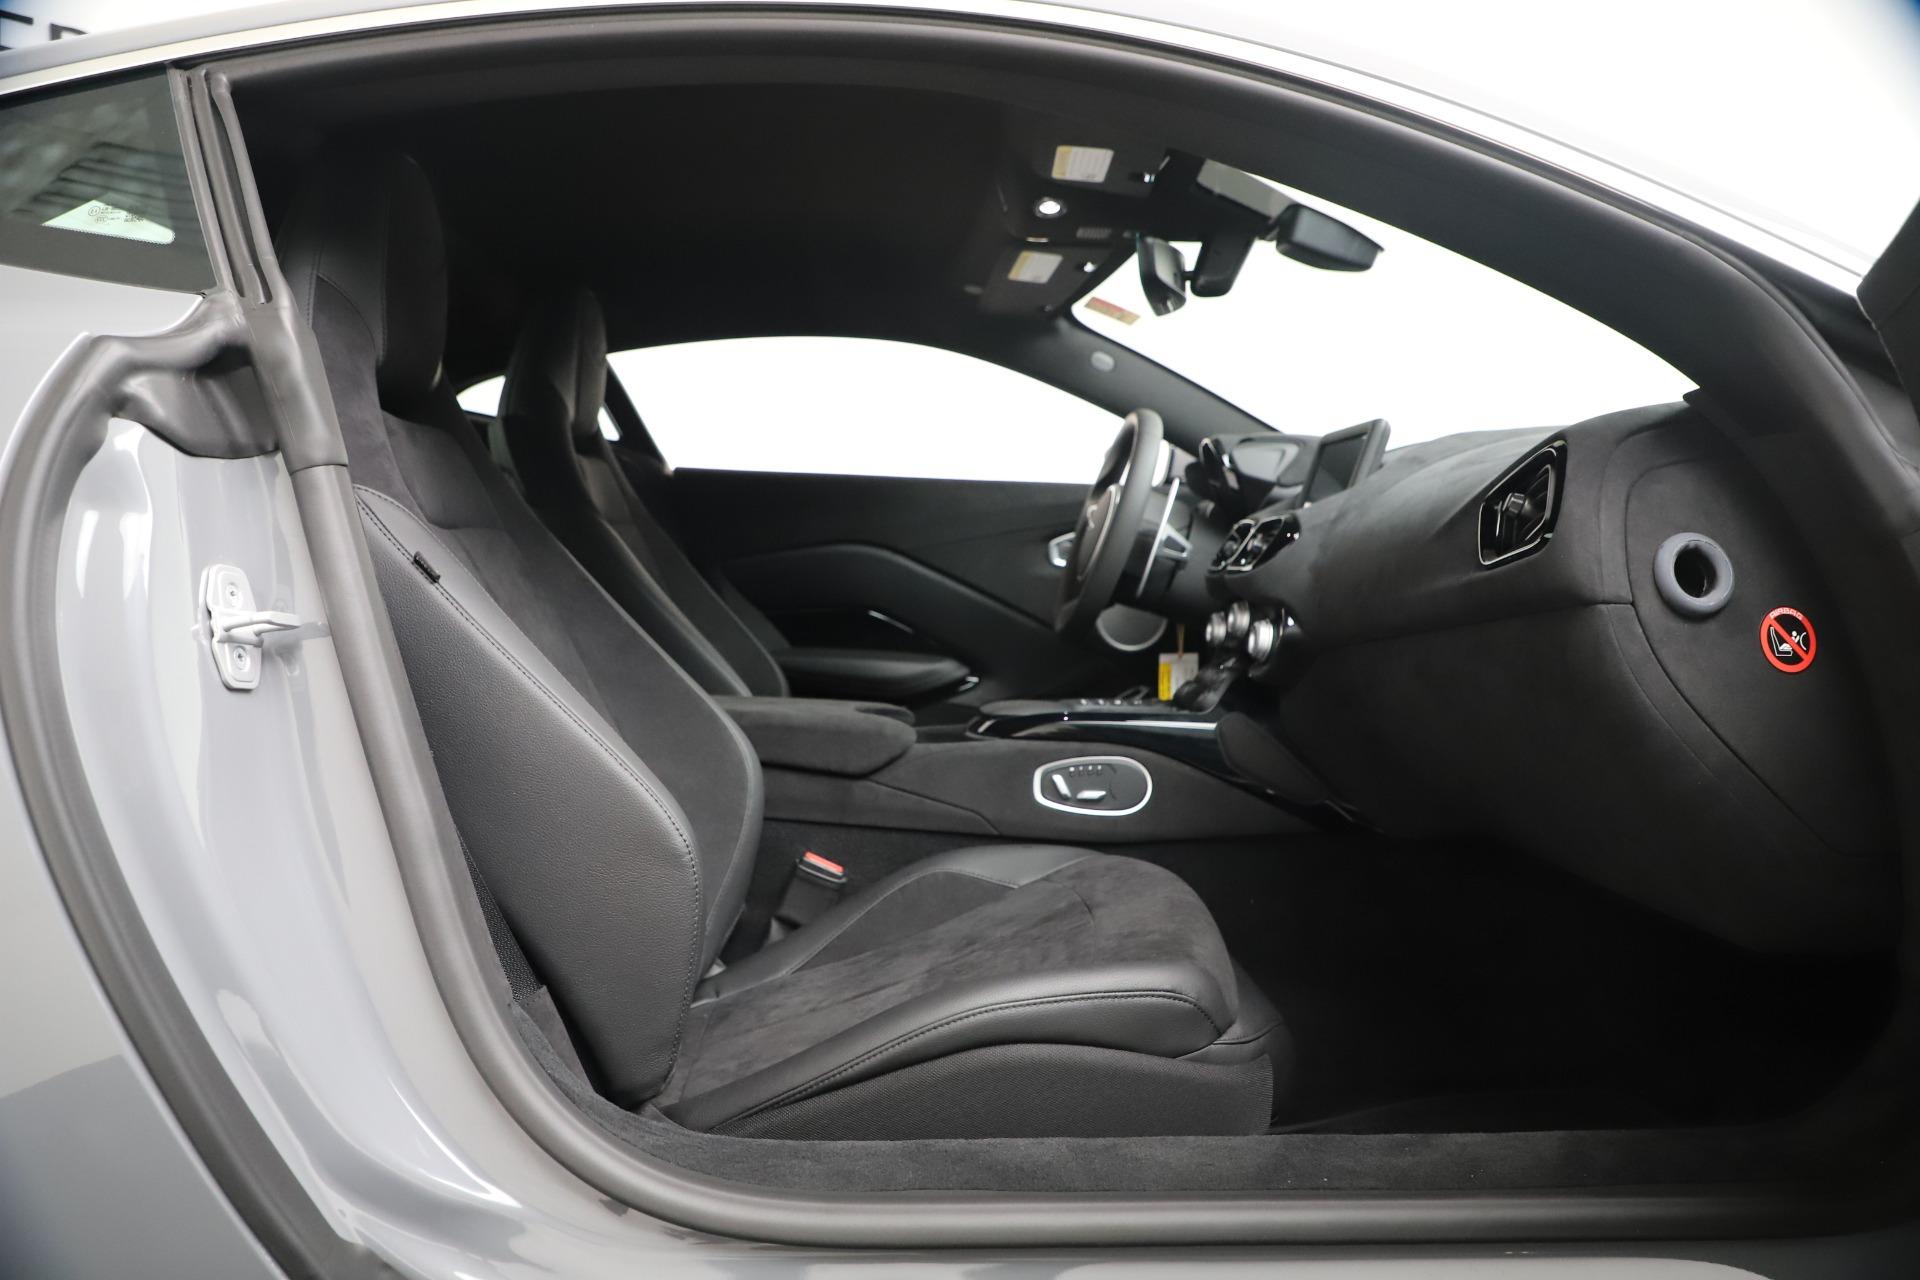 New 2020 Aston Martin Vantage V8 For Sale In Westport, CT 3368_p14